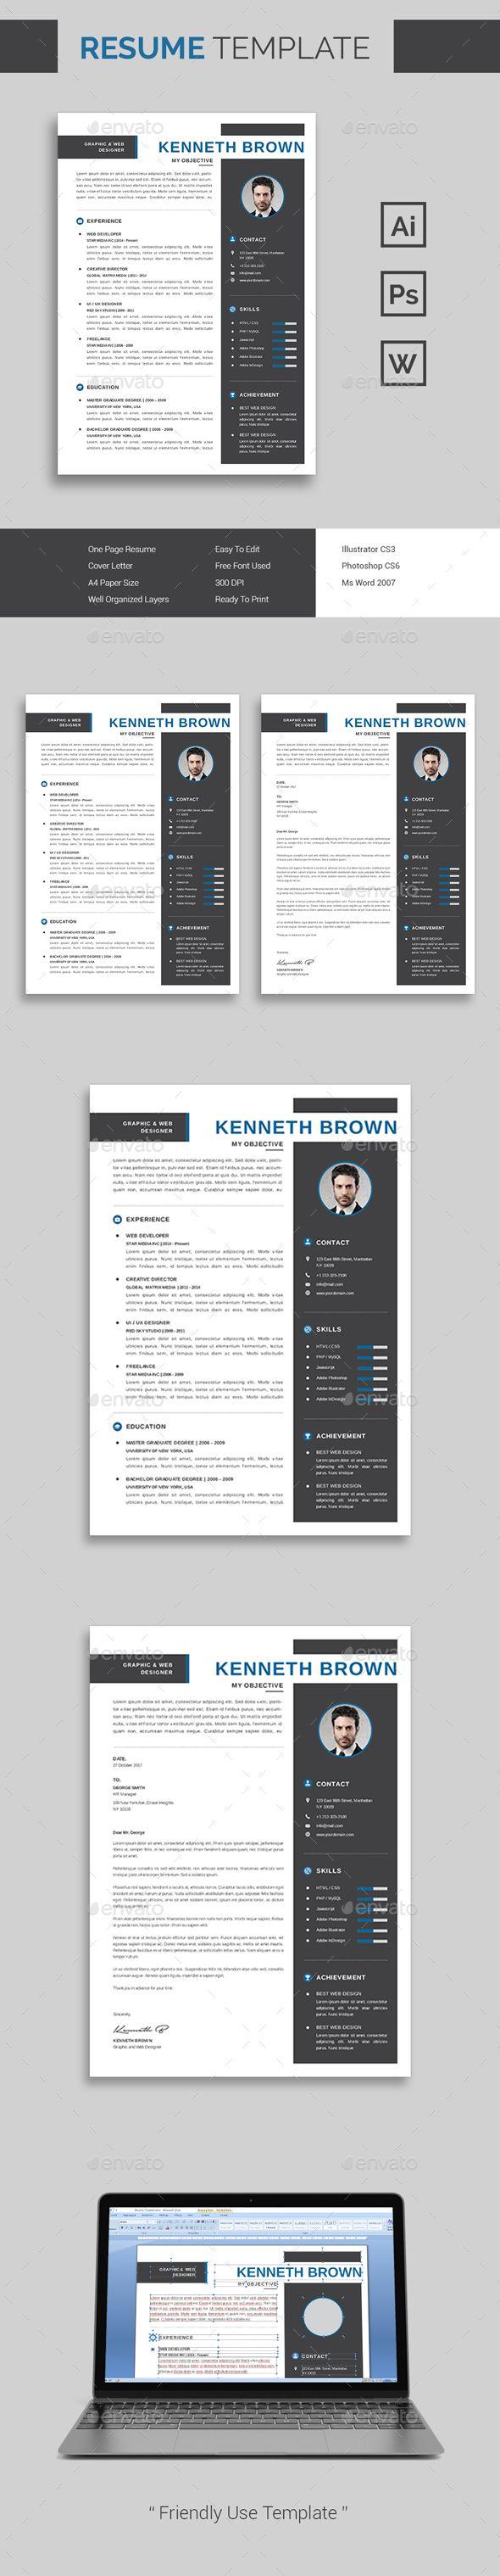 Resume Template | CV Template PSD, AI Illustrator, DOCX & DOC